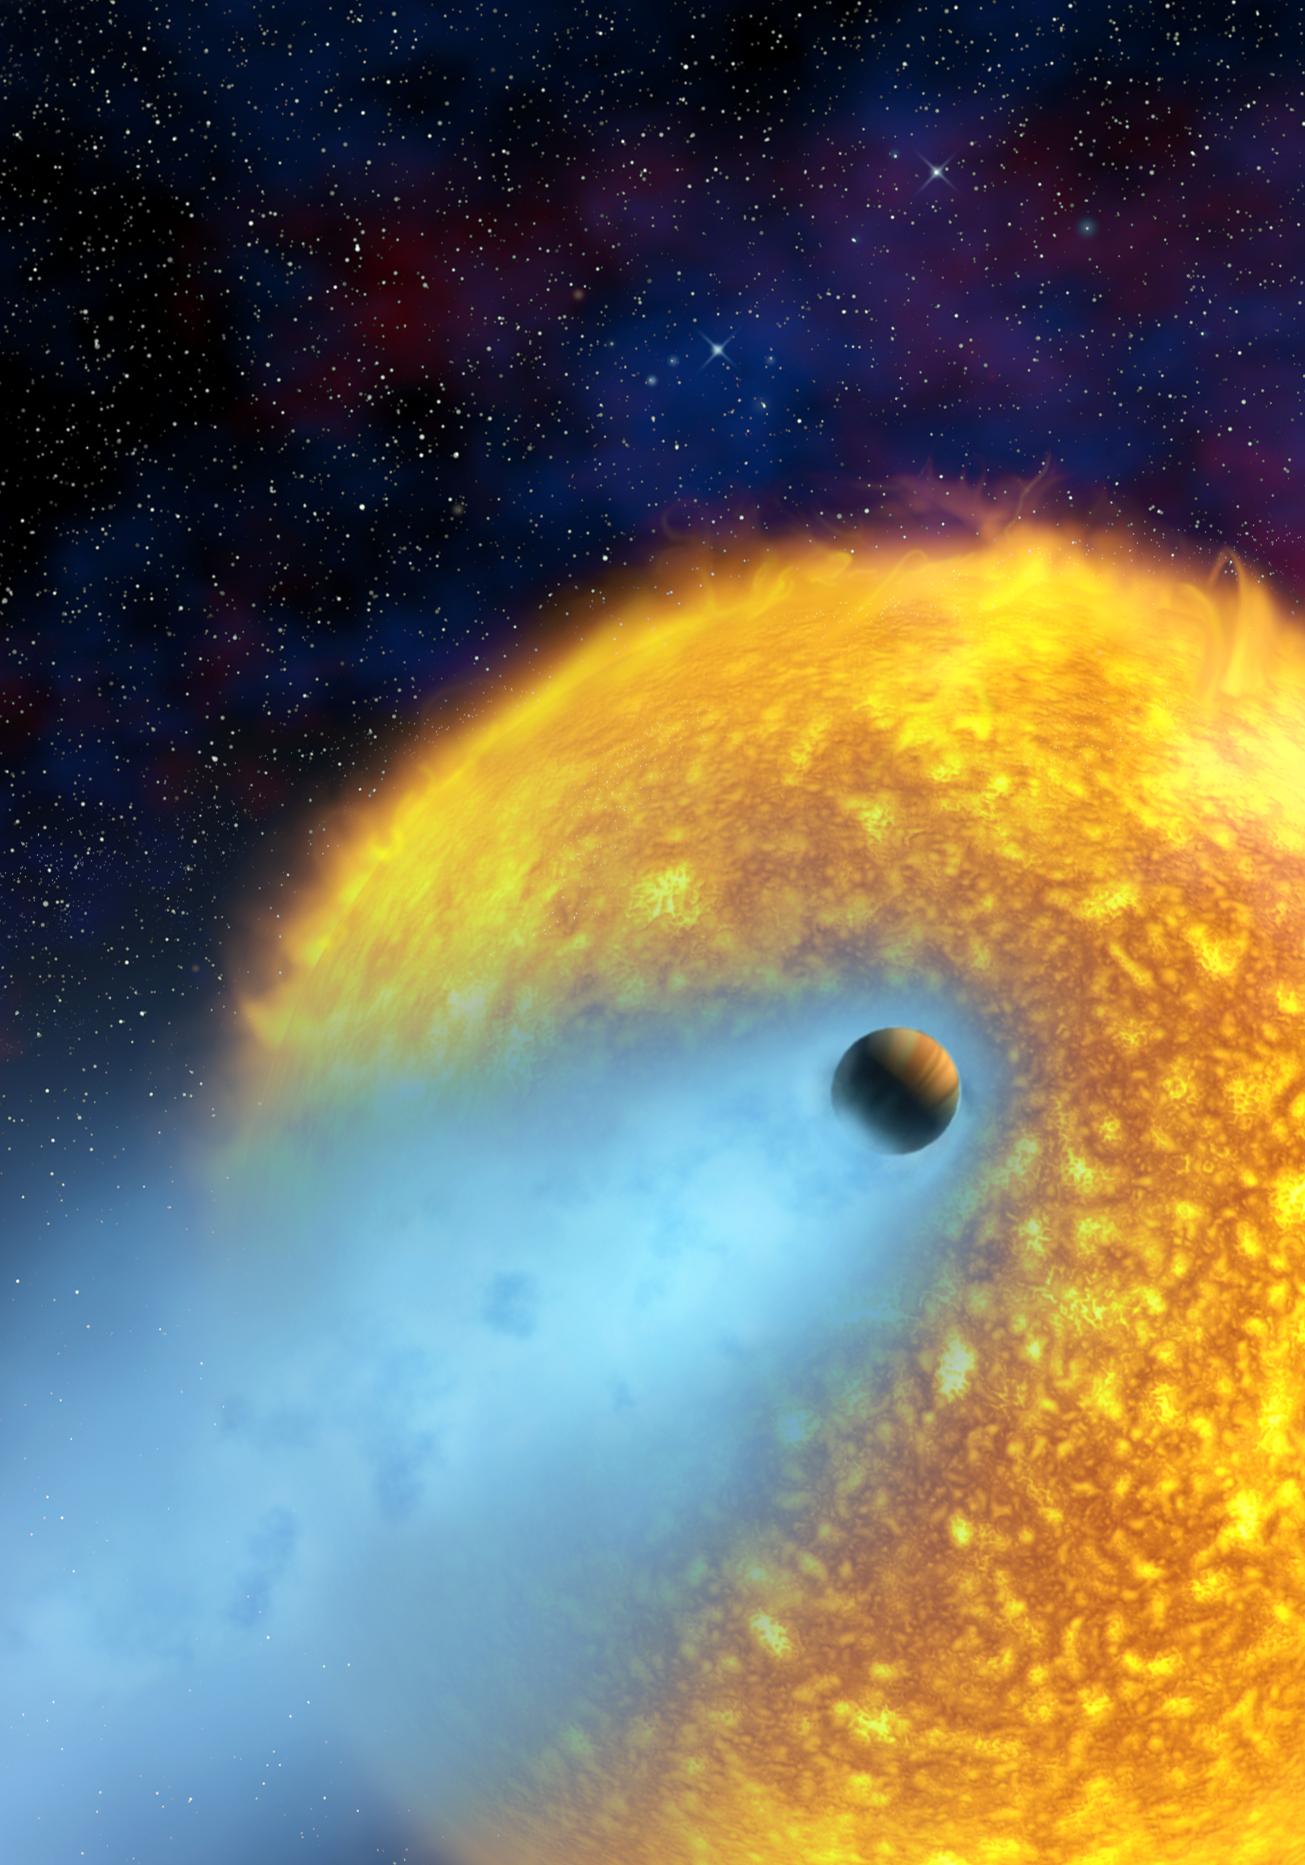 http://upload.wikimedia.org/wikipedia/commons/4/4b/Osirisplanet.jpg